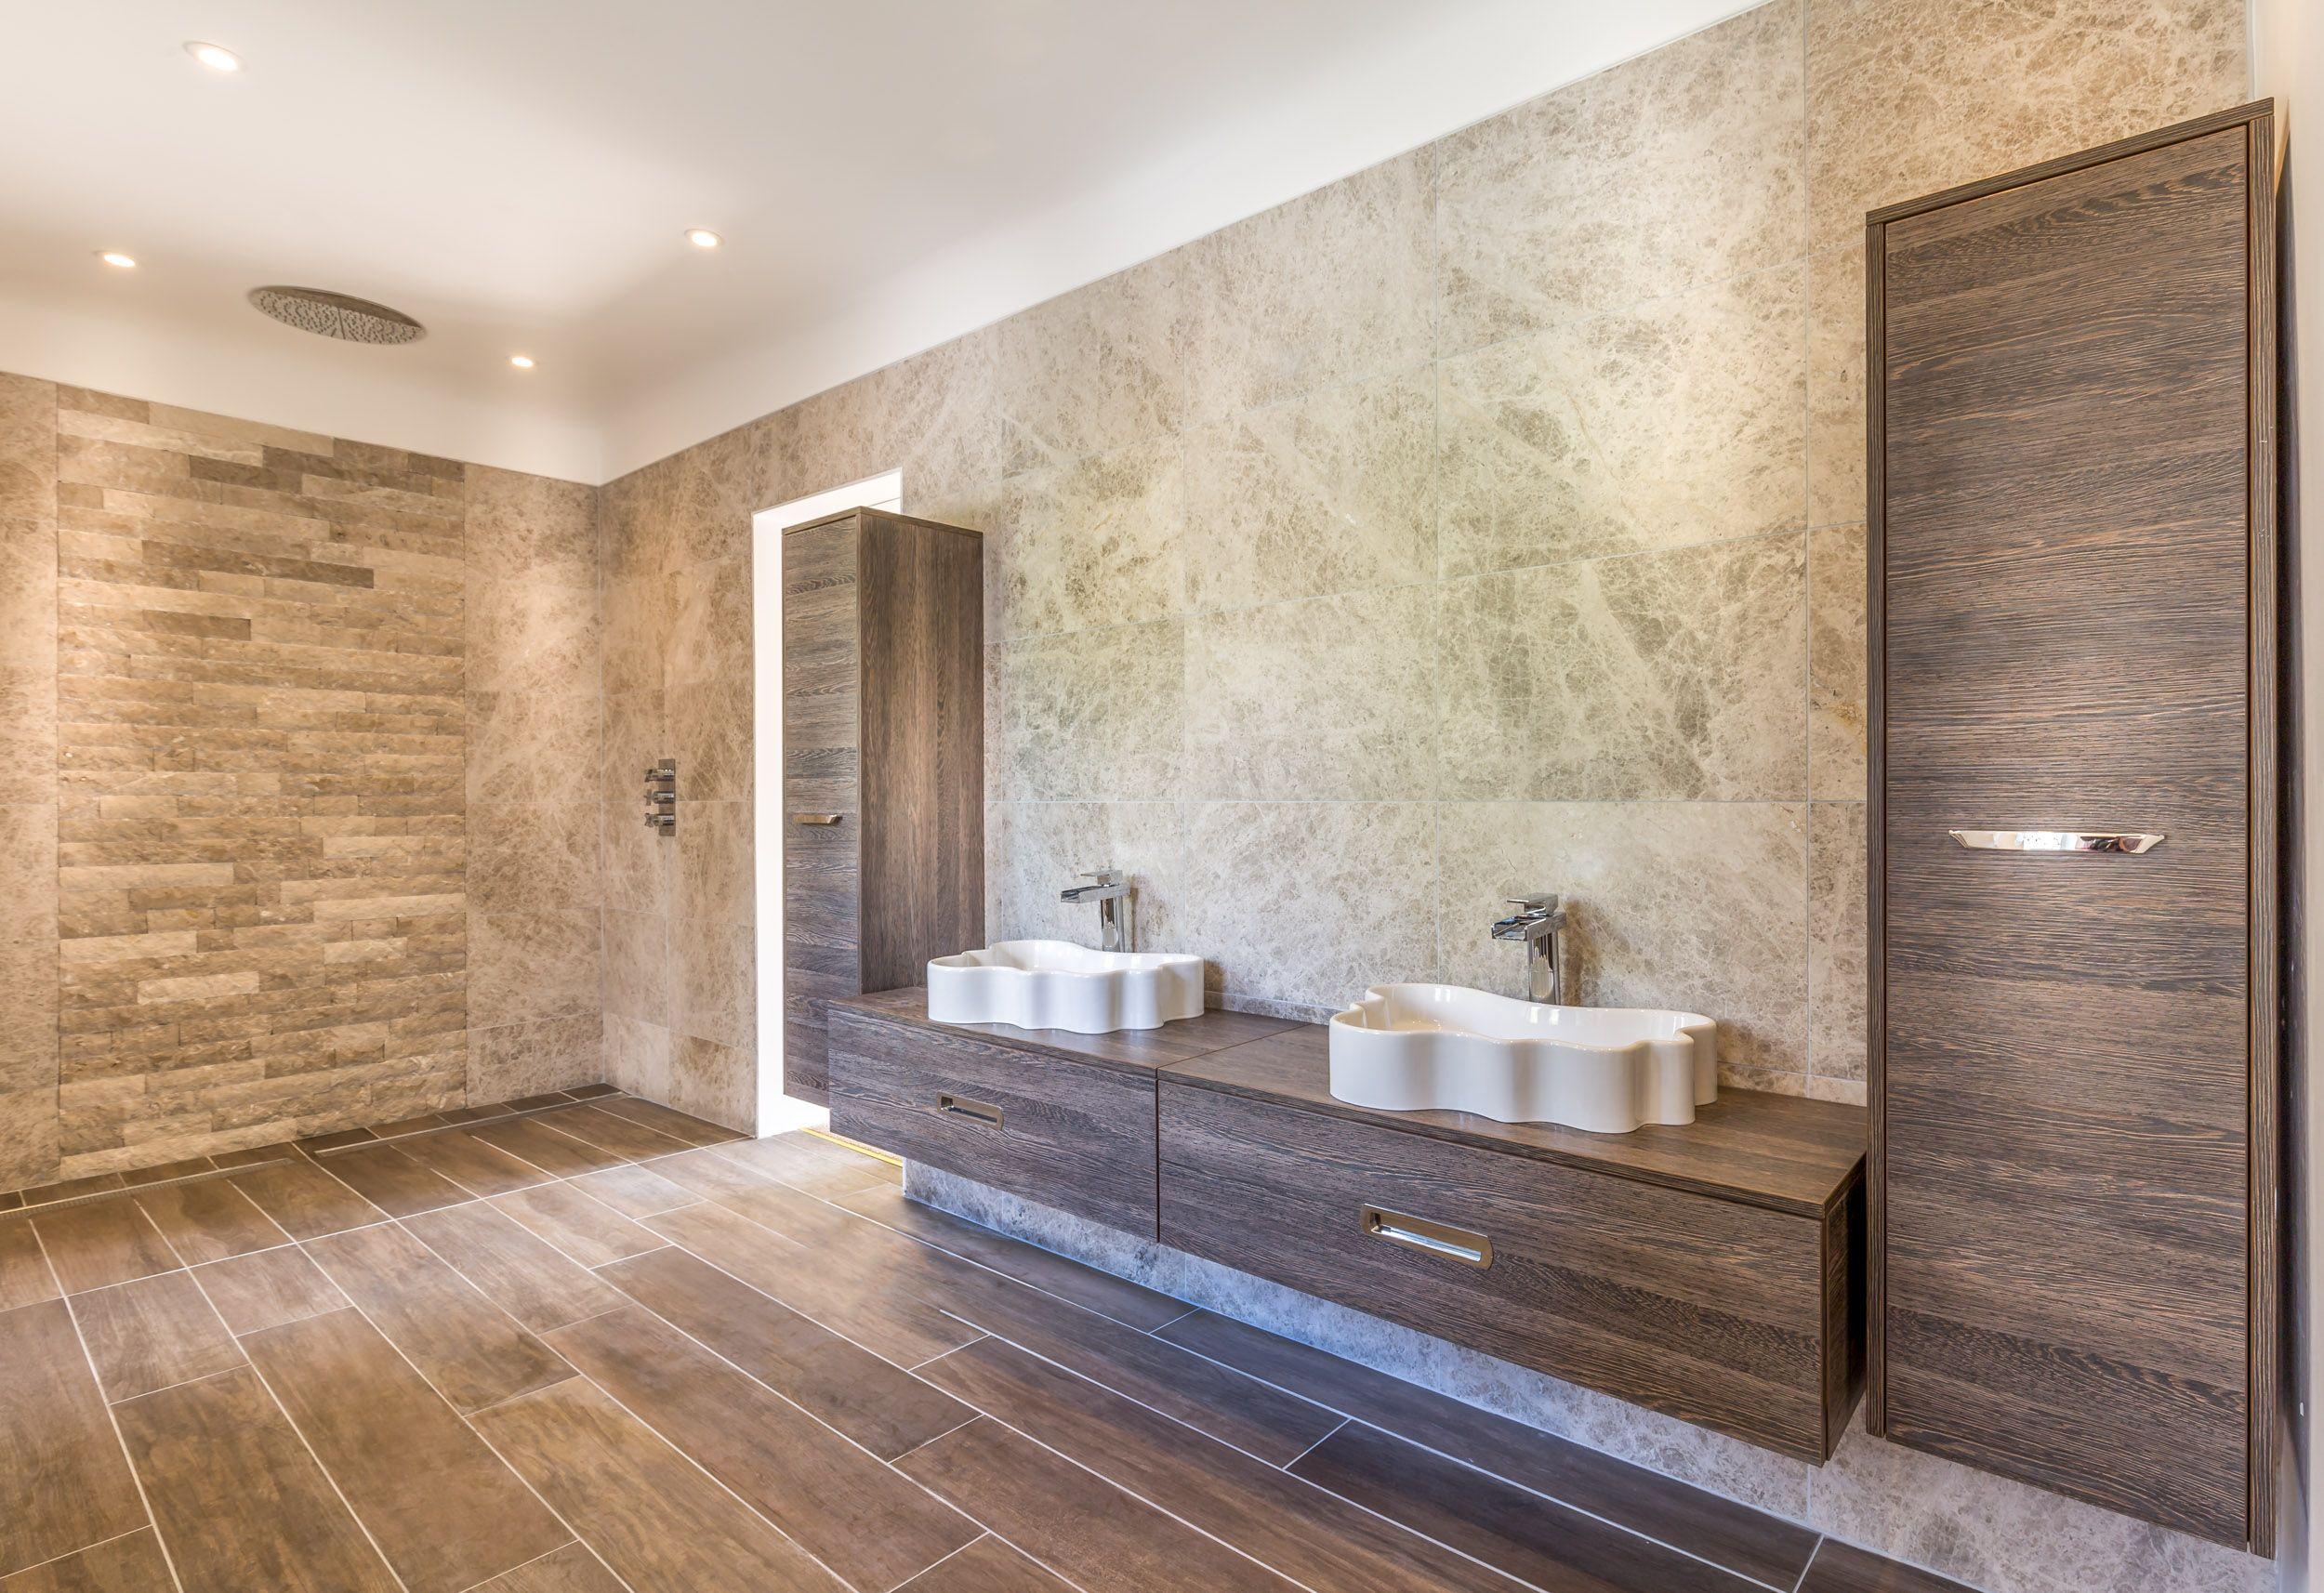 Master Bedroom Ensuite Designs Classy Contemporary Master Bedroom Ensuite  Double Sink  Large Walk In Inspiration